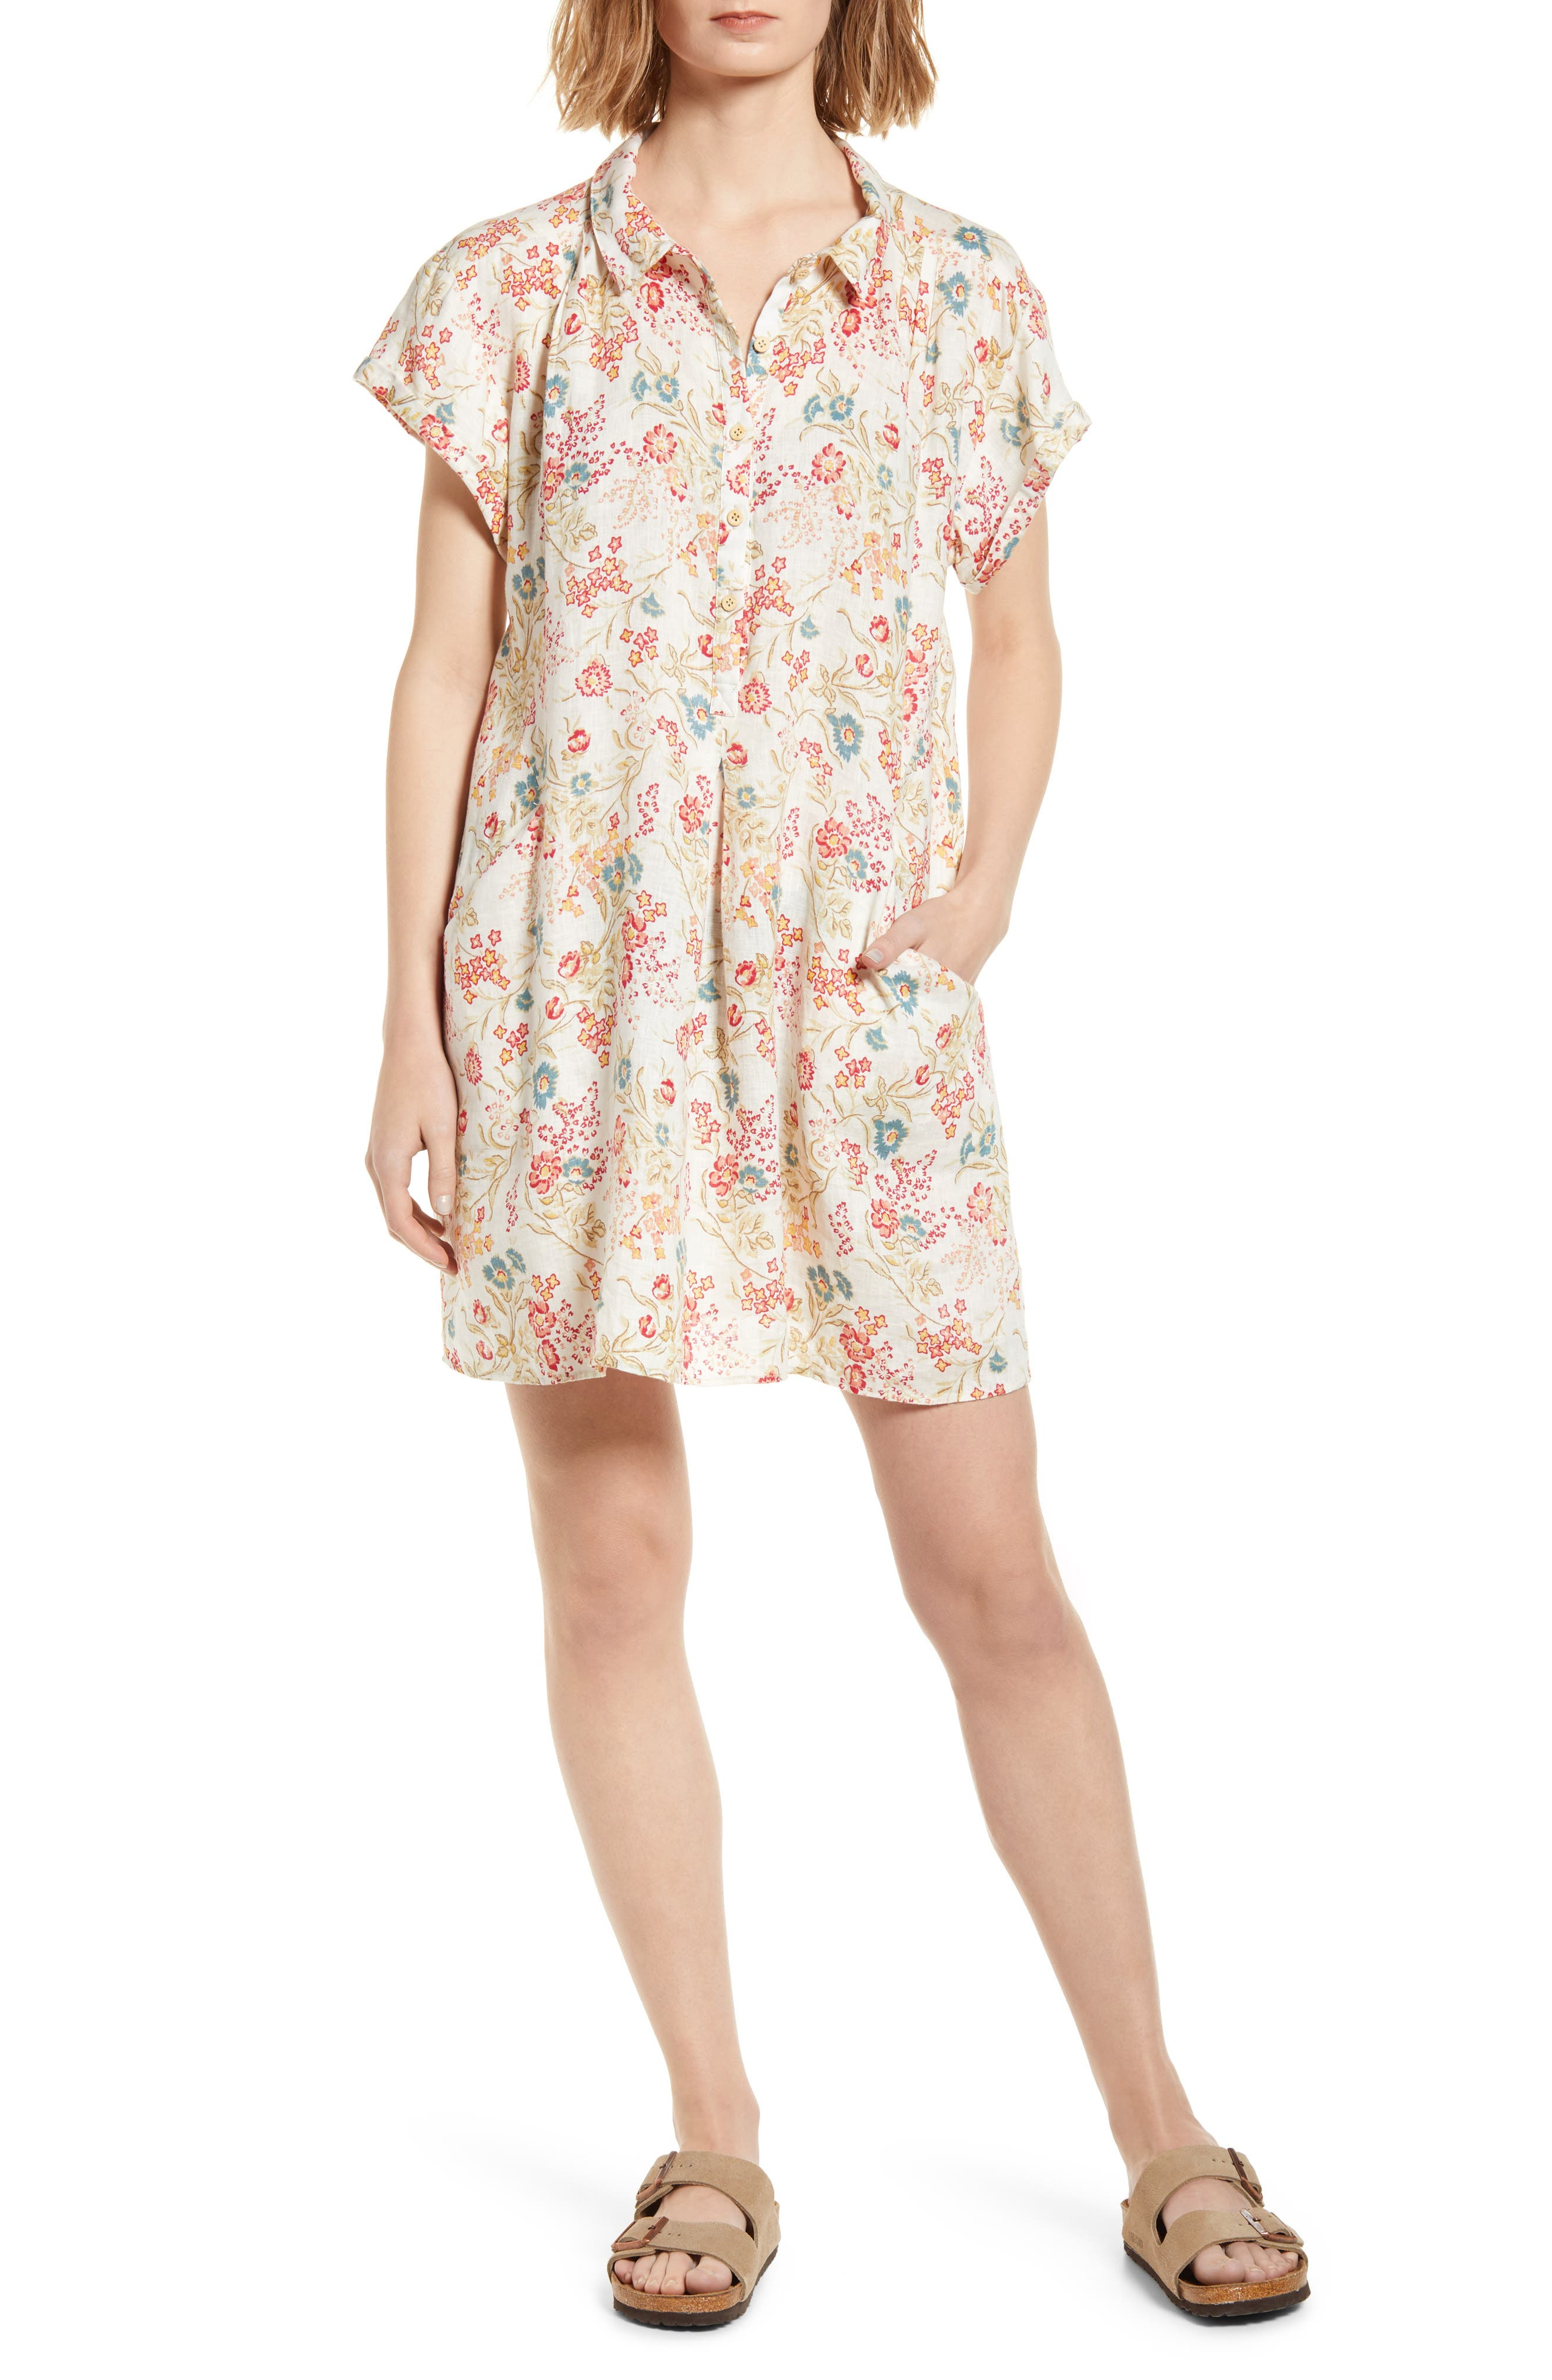 Hana Floral Organic Cotton Shirtdress